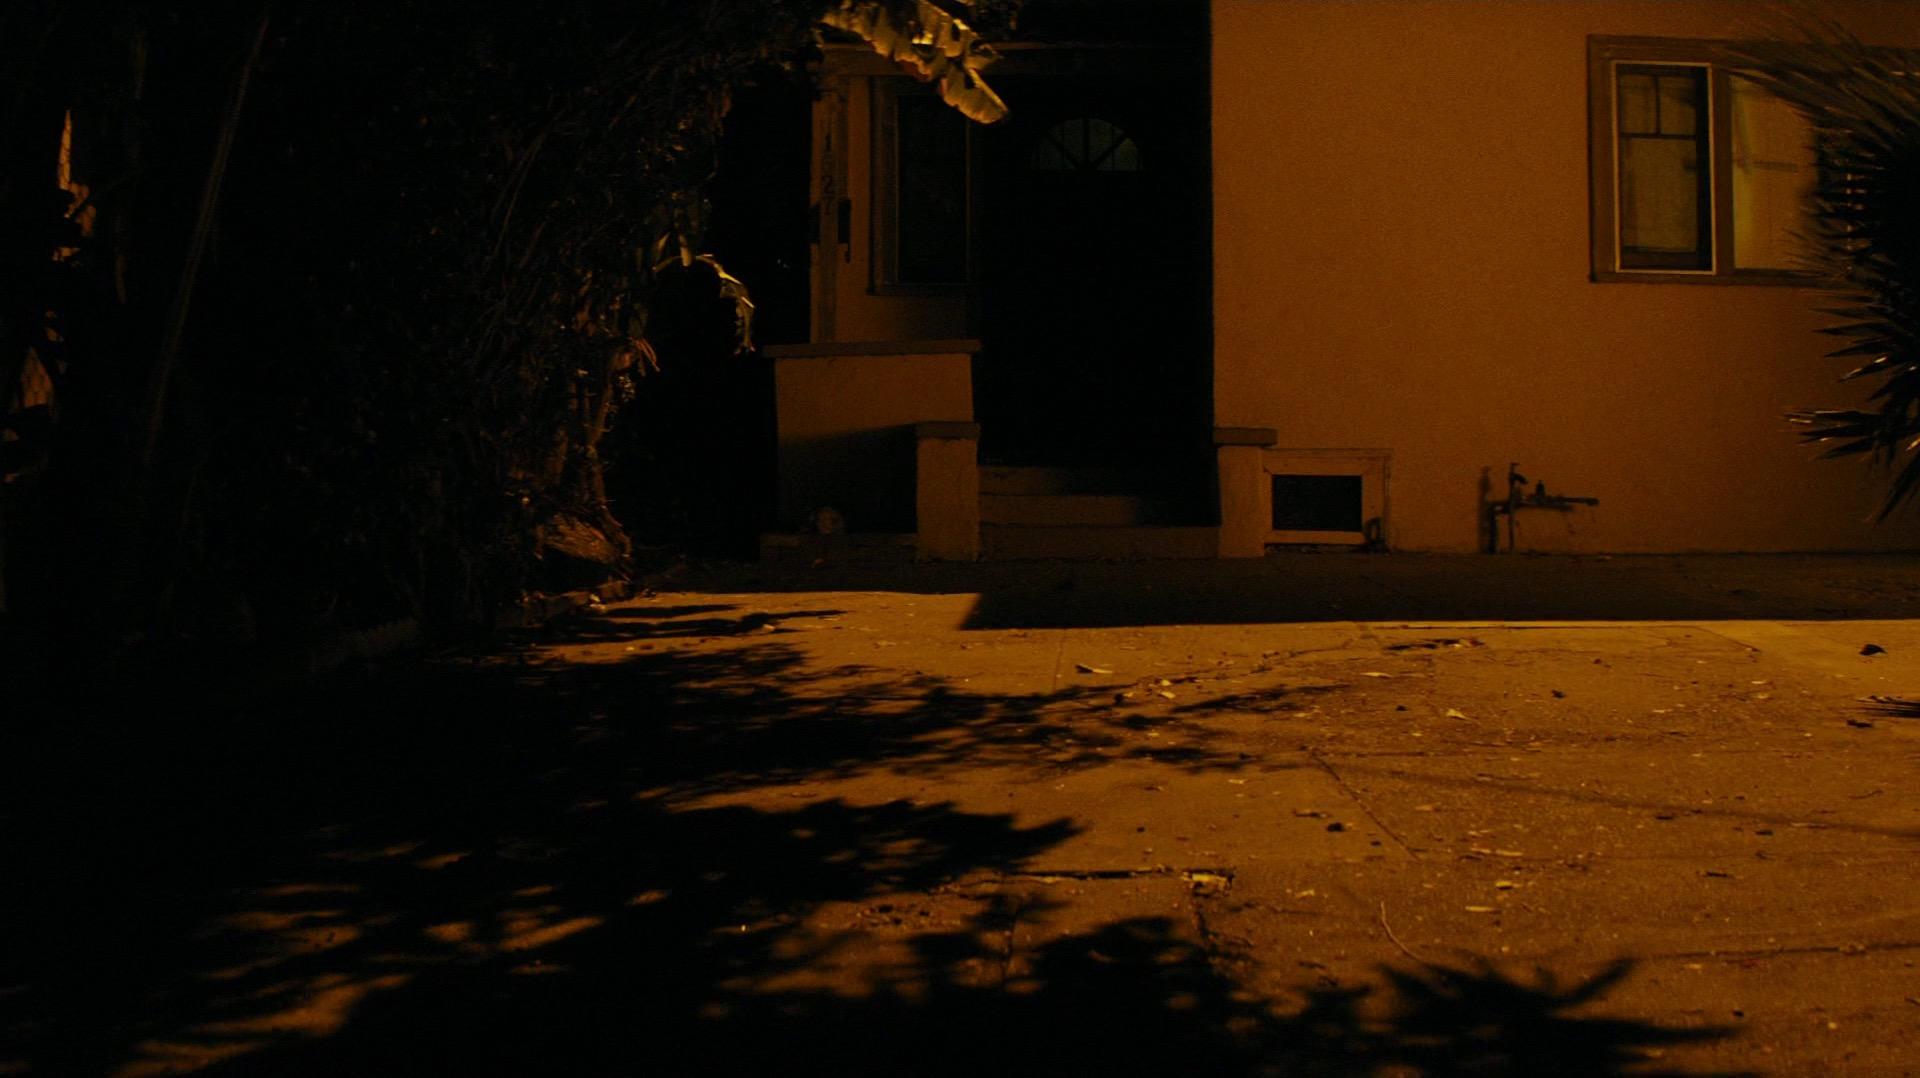 The episode's final shot